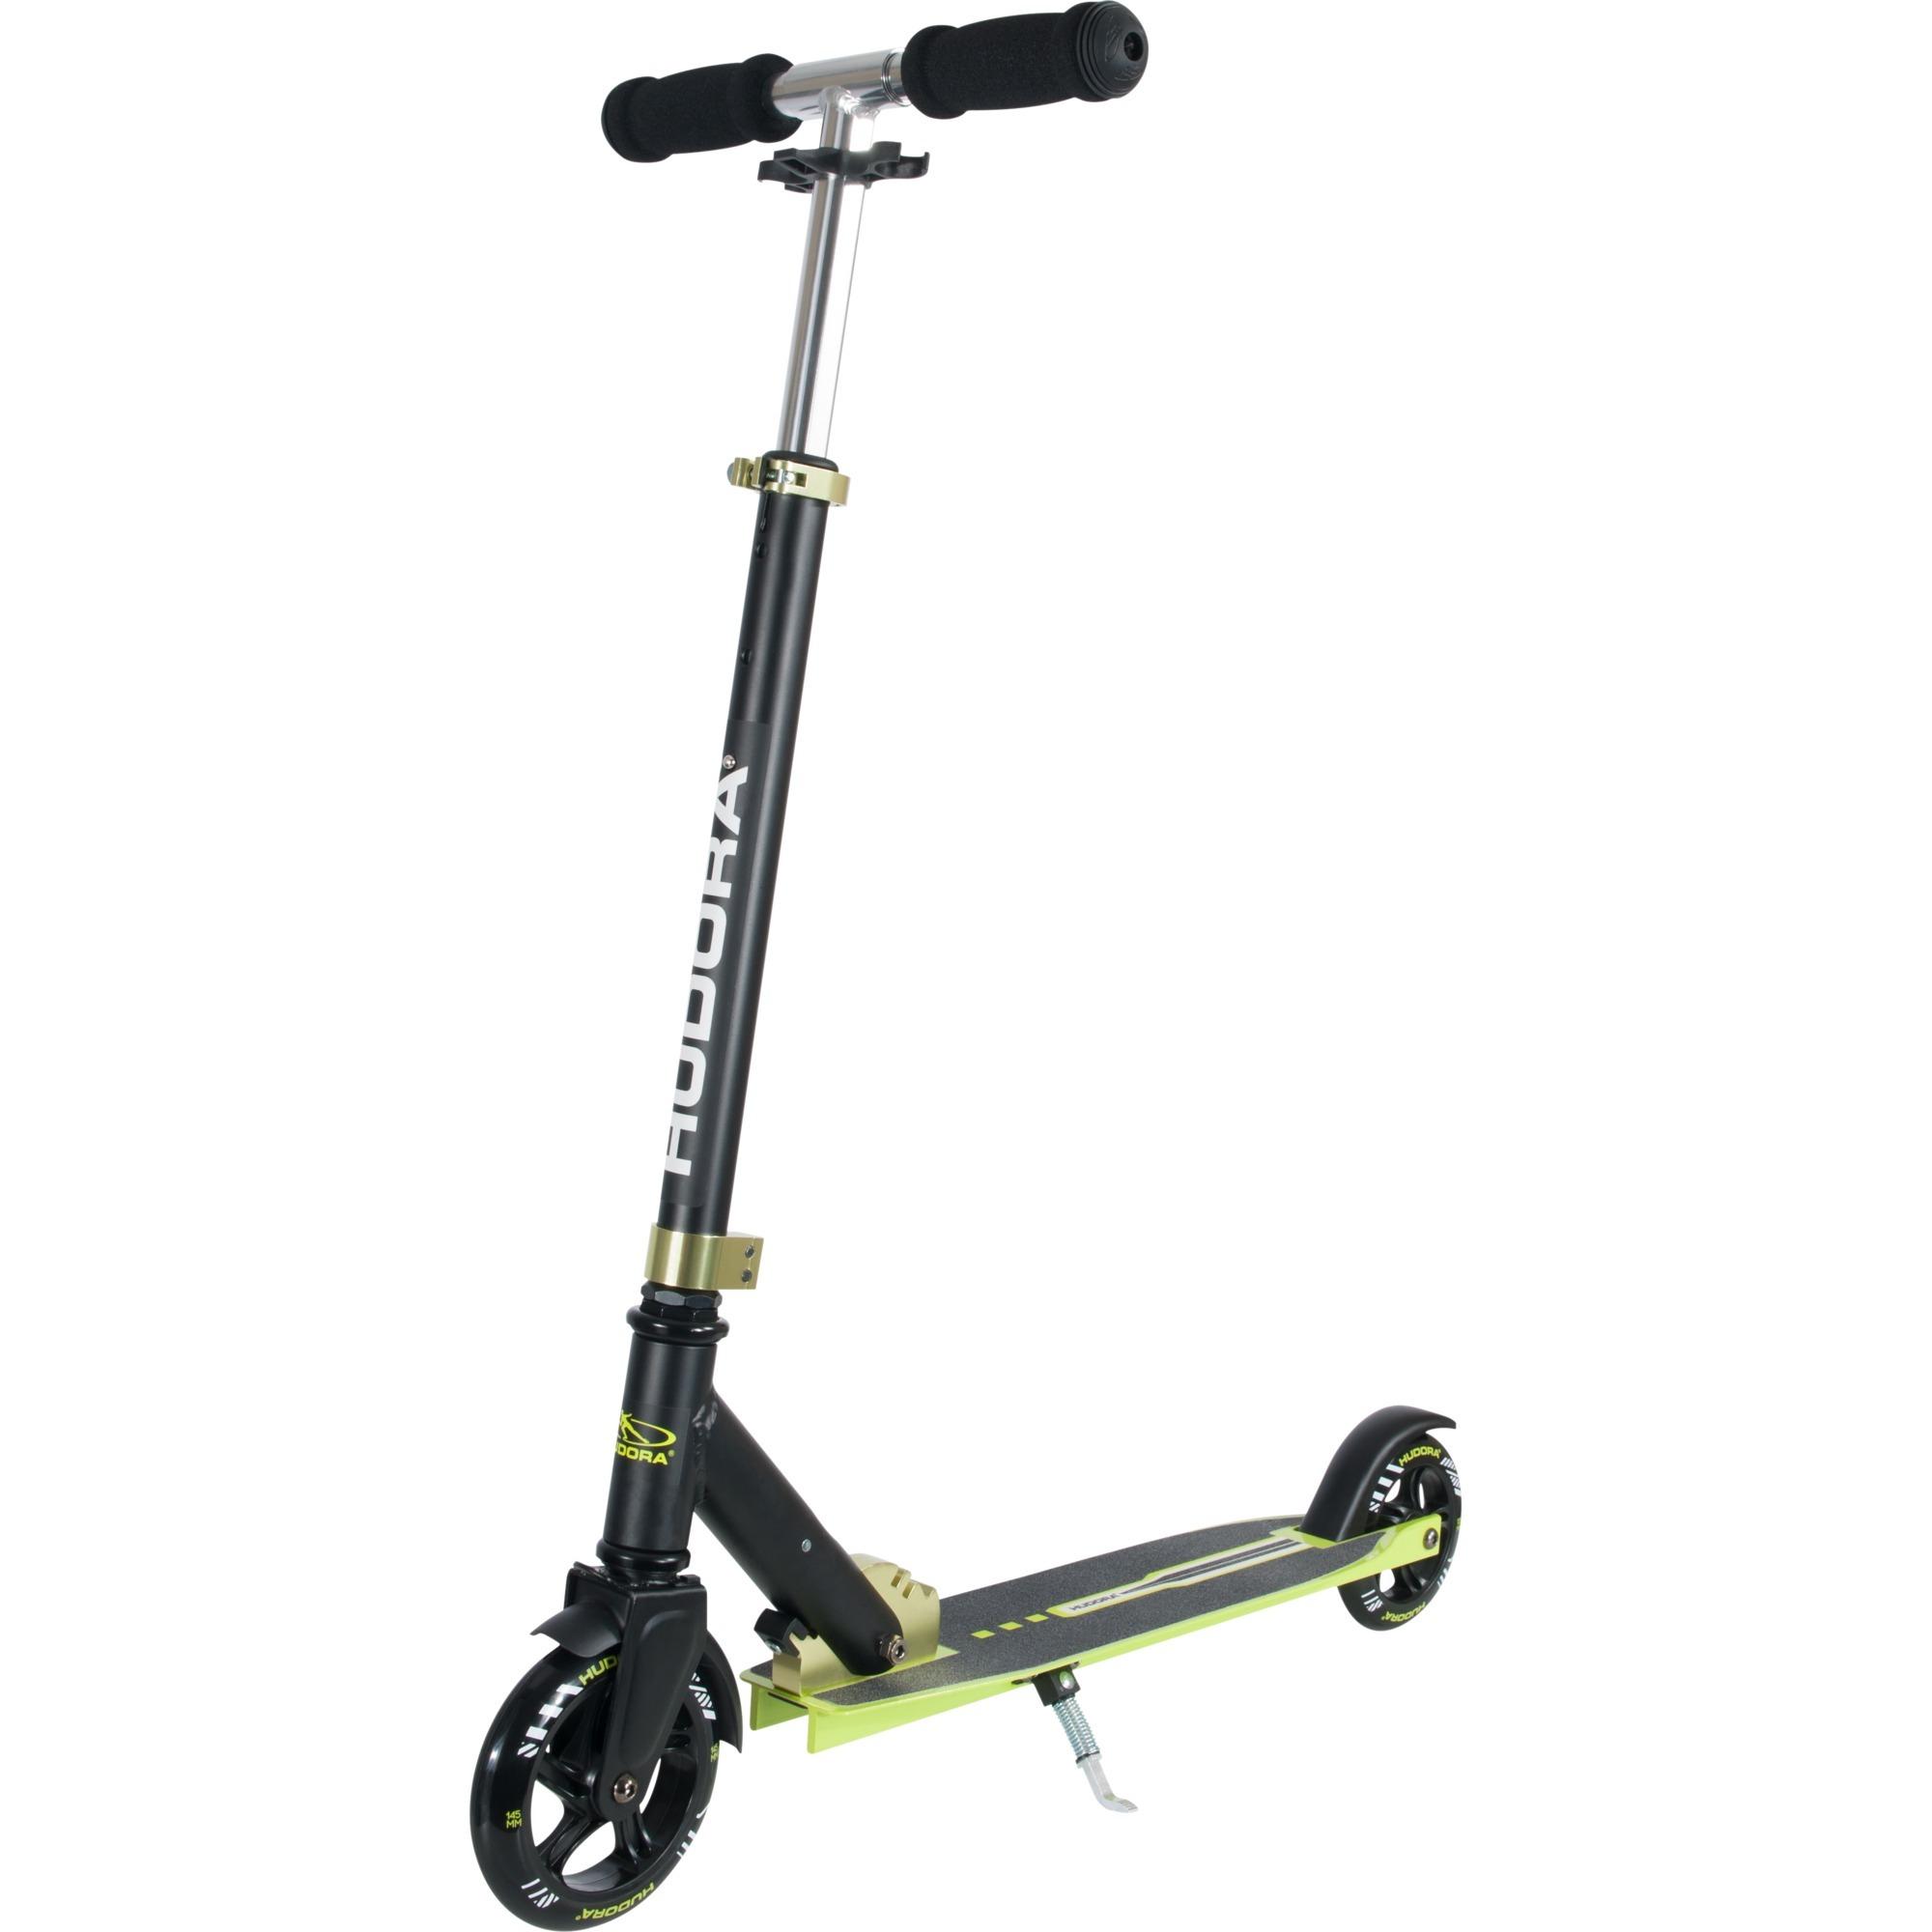 14255 Adultos Negro, Verde scooter, Vespa